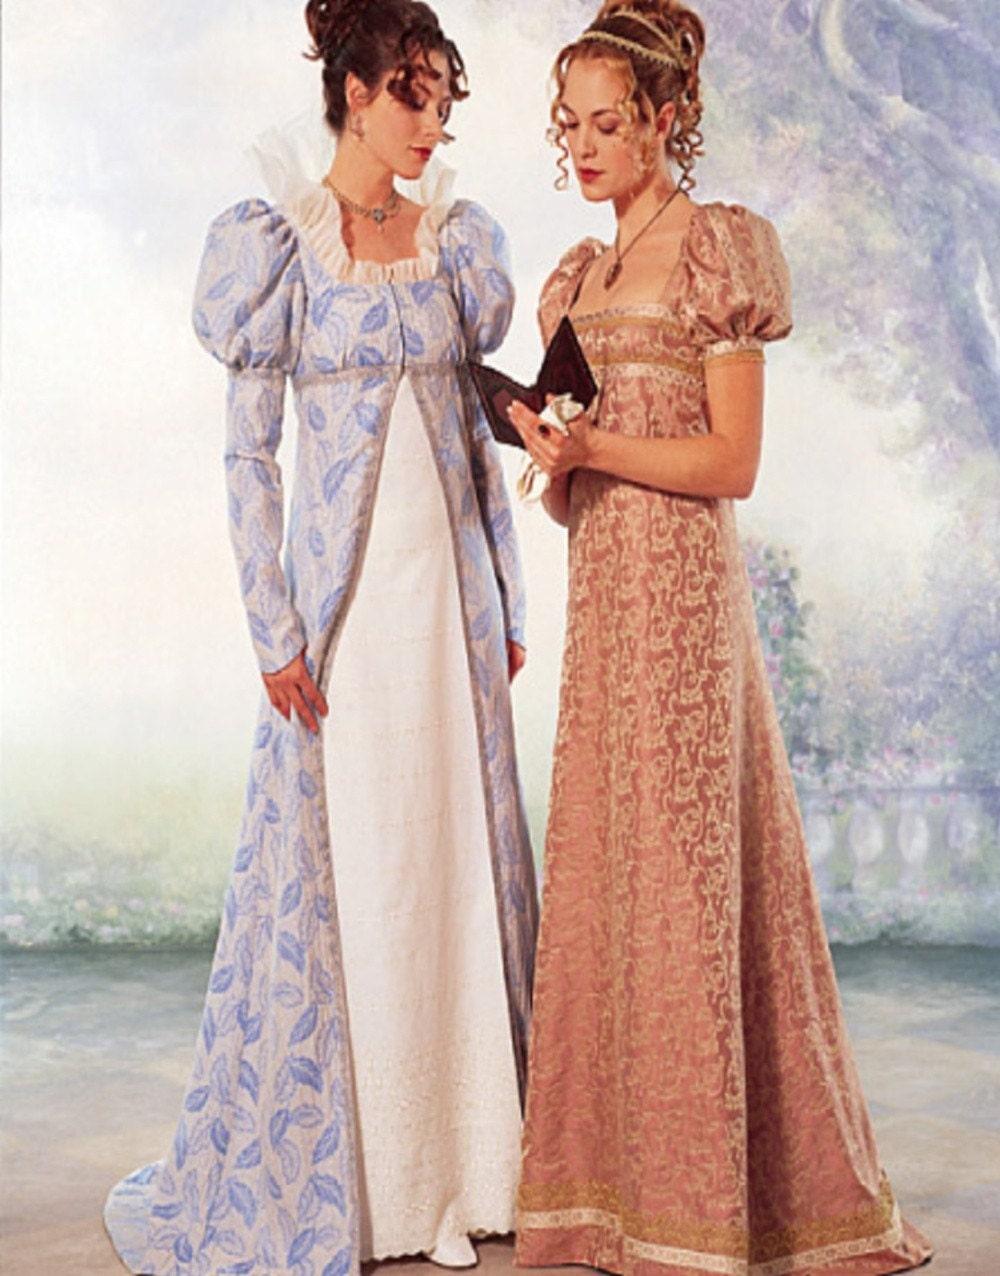 new plus size victorian style coat dress sew pattern 6630